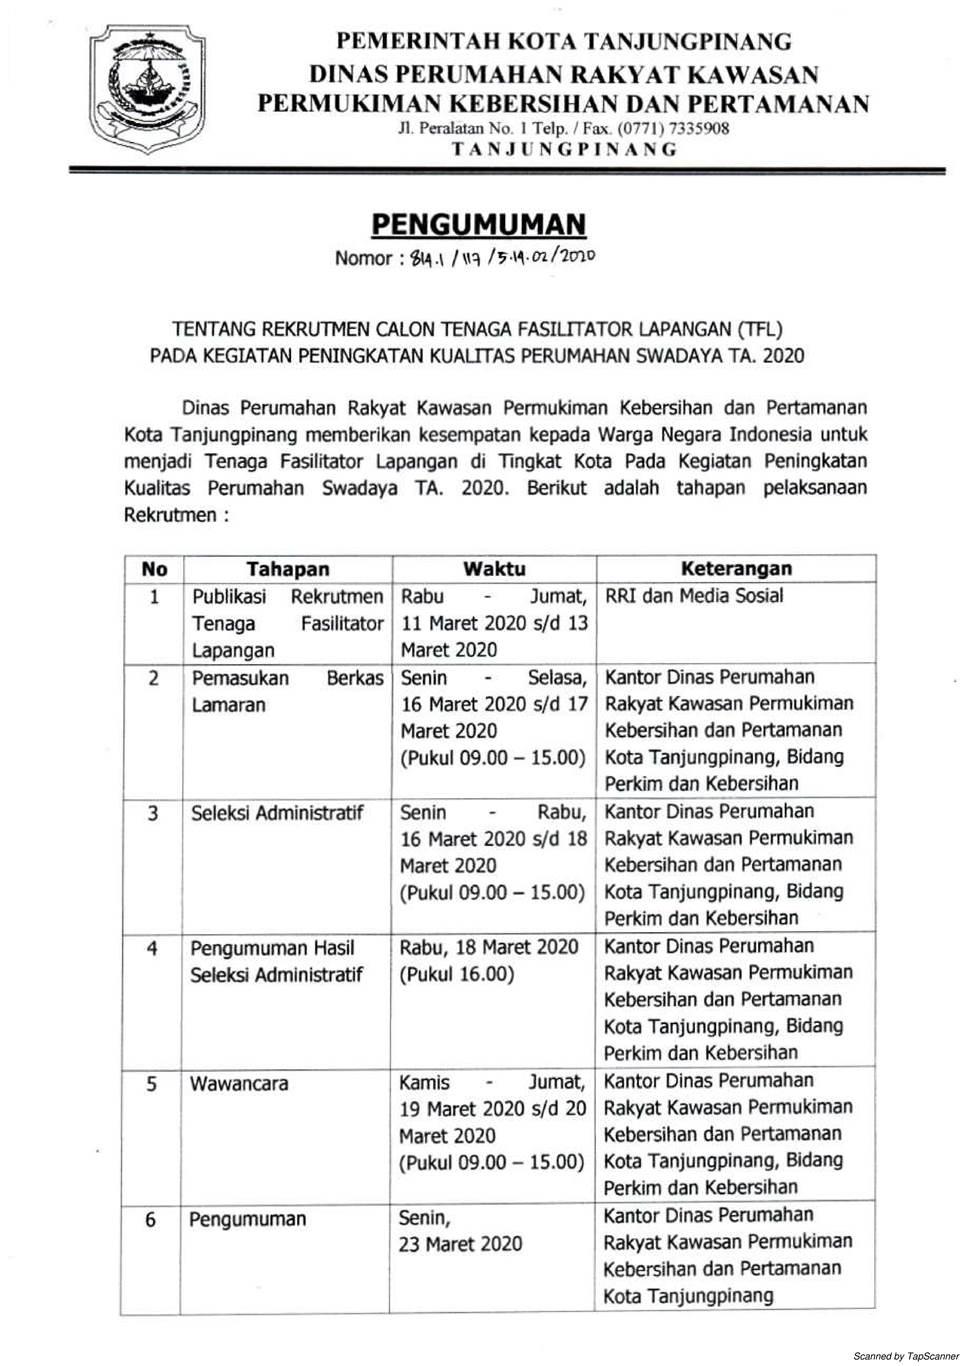 Rekrutmen Tenaga TFL Dinas Perumahan Rakyat Kawasan Permukiman Kebersihan dan Pertamanan Bulan Maret 2020